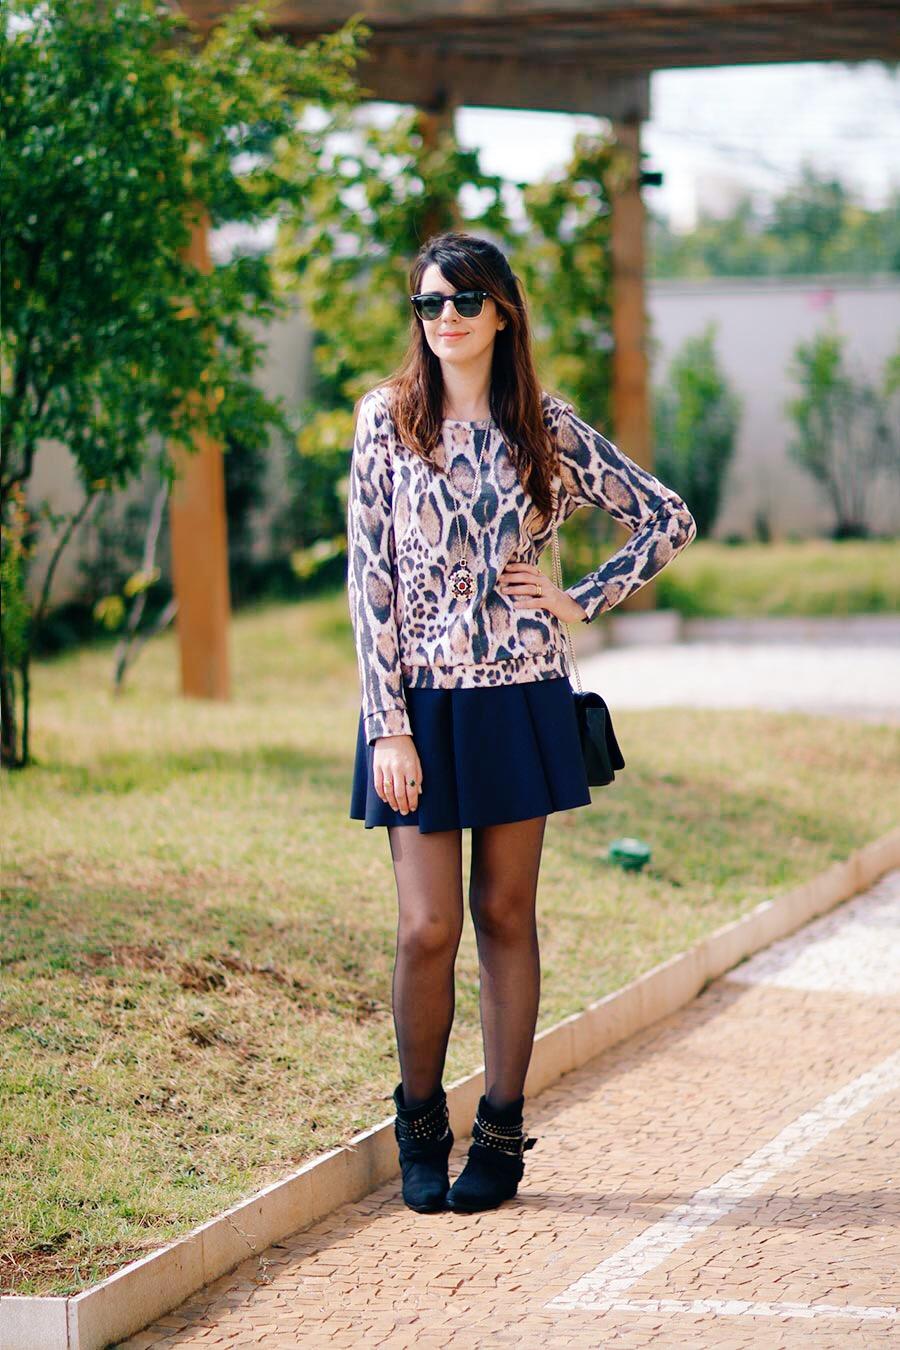 bota feminina-roupas femininas-blog de moda-fashion blog-moda feminina-bolsa tiracolo-bota-saia rodada-saia preta-bolsa de corrente-bota com tachas-saia curta-moletom-Óculos de sol-moda feminina